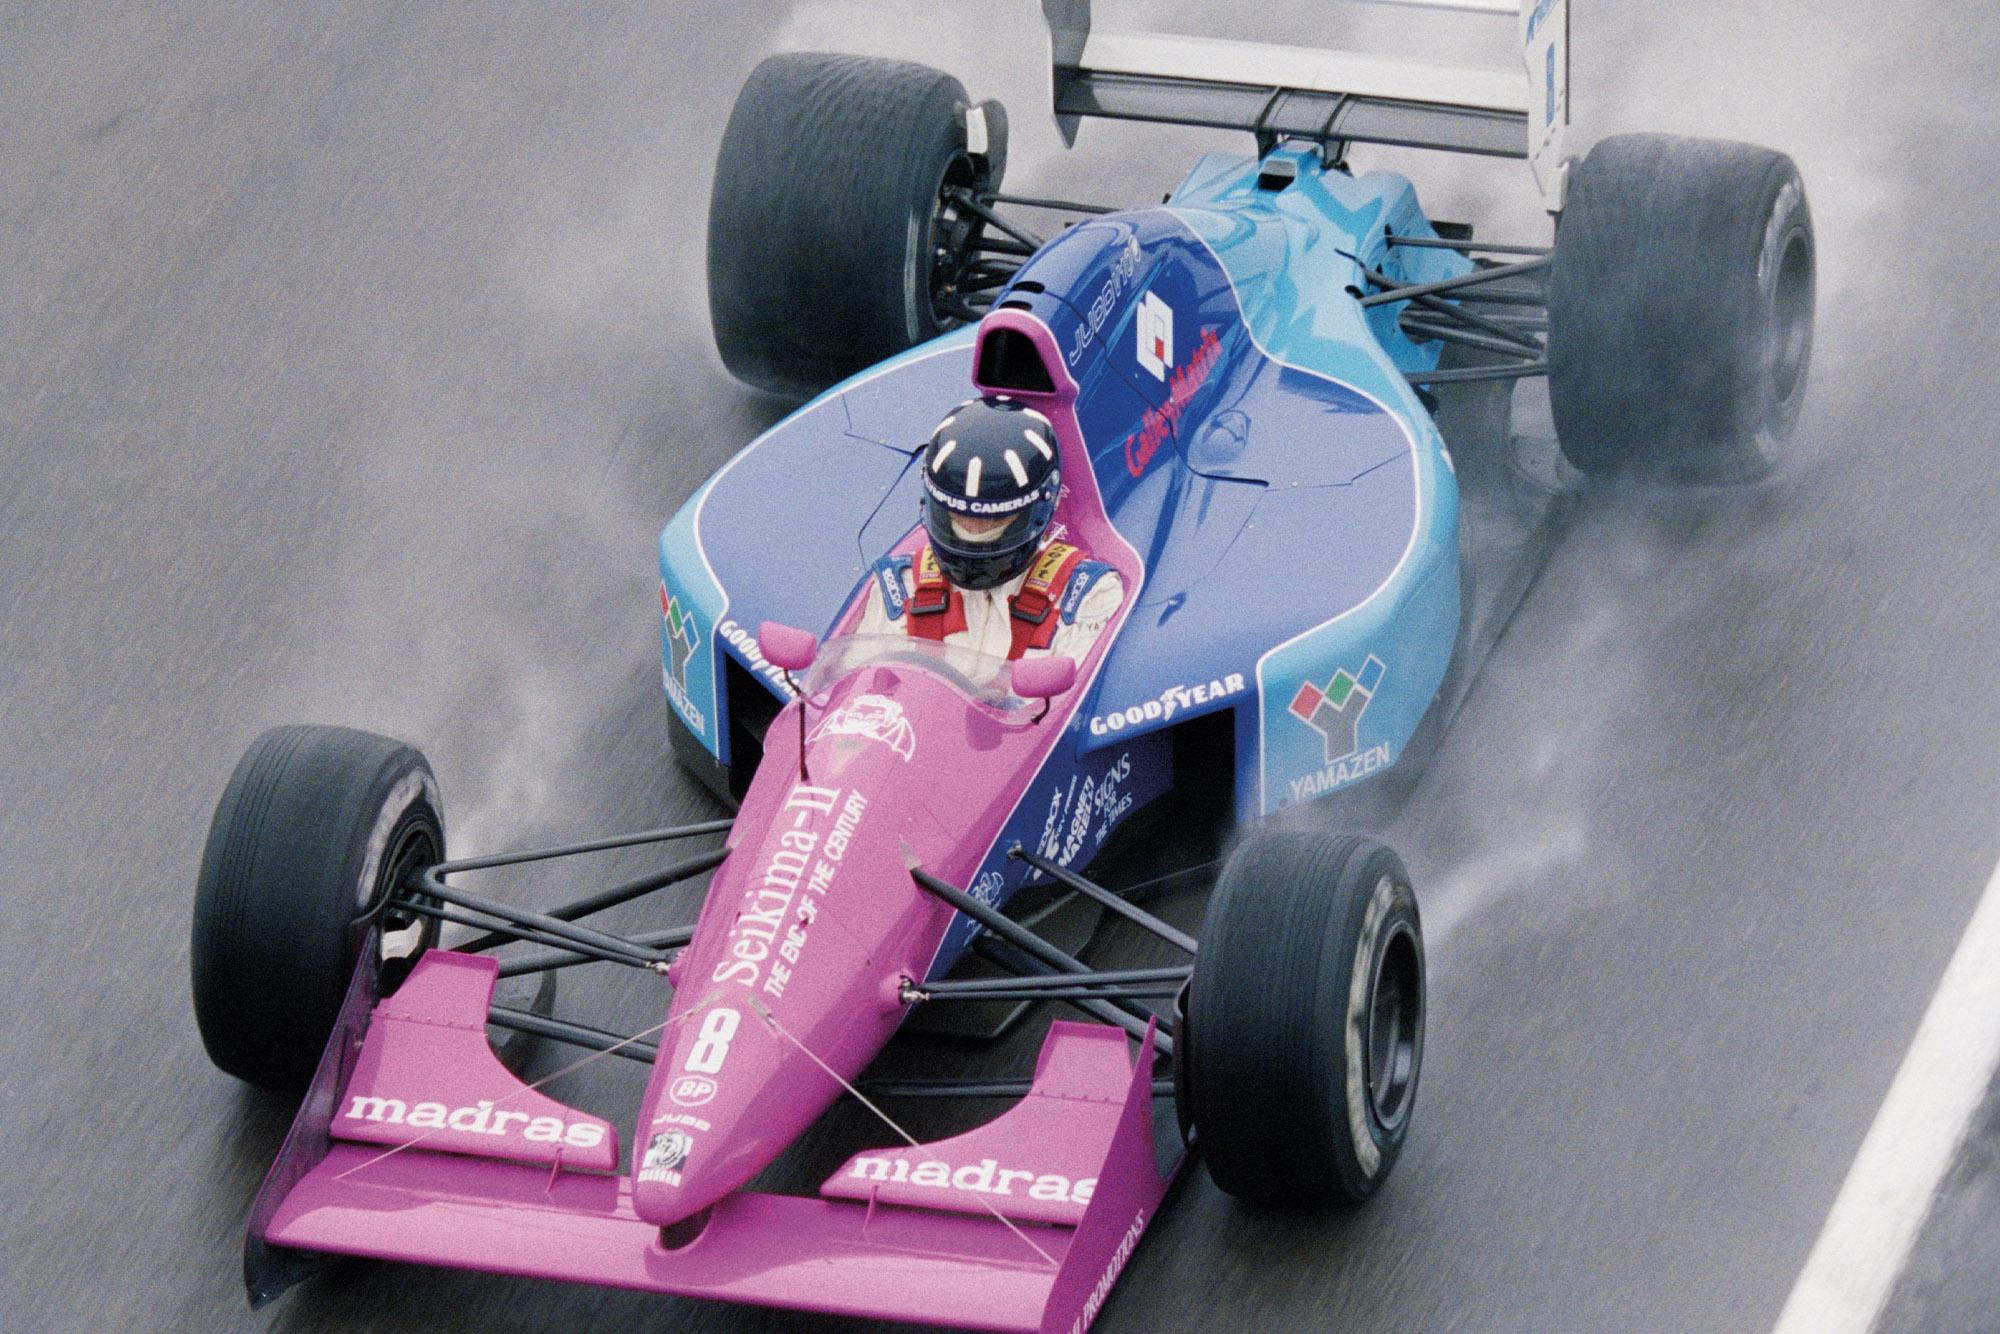 Damon Hill in a Brabham at the 1992 British Grand Prix